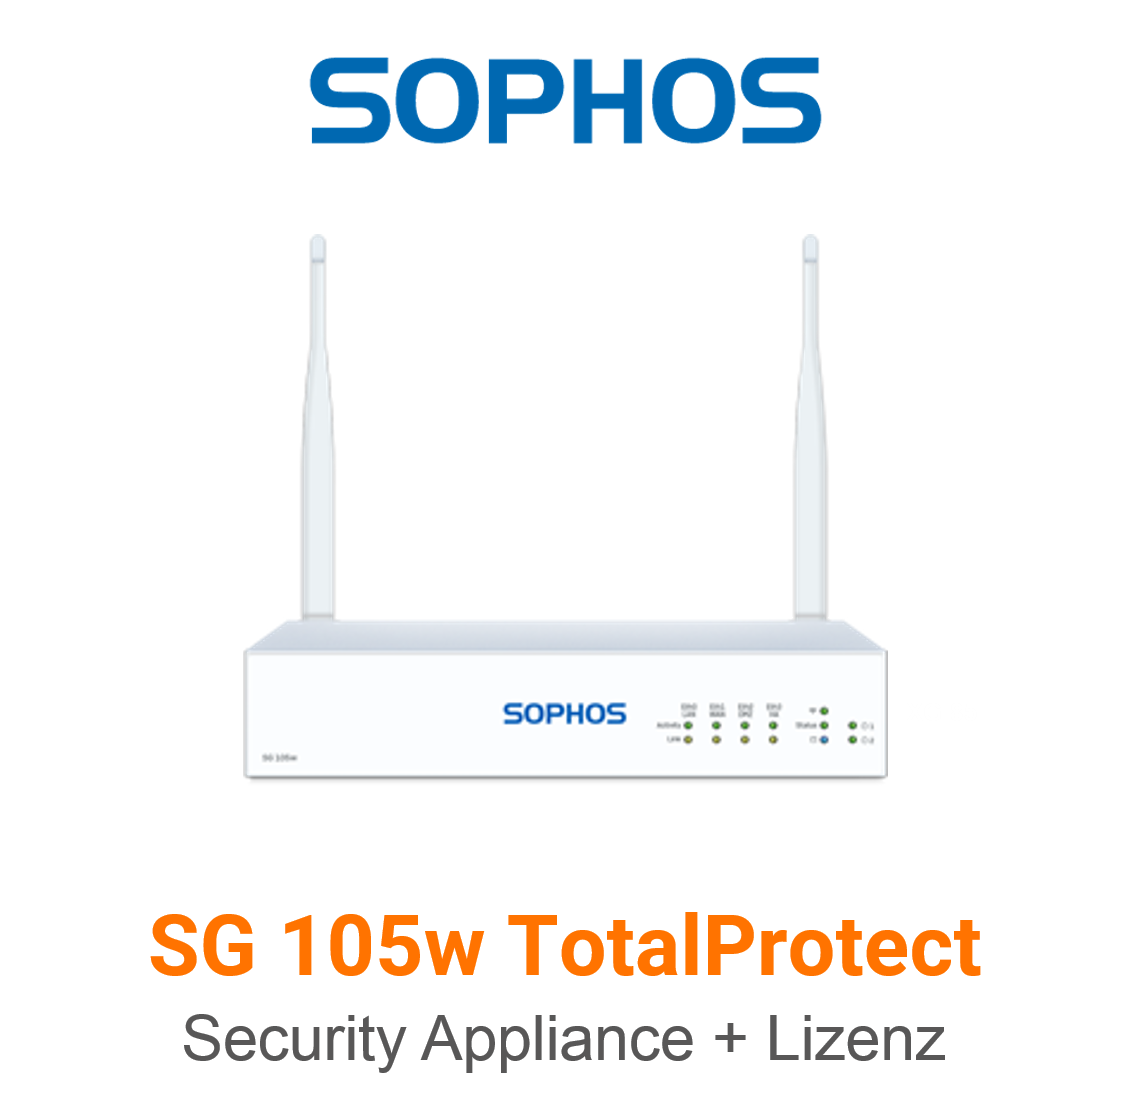 Sophos SG 105w TotalProtect Bundle (Hardware + Lizenz)